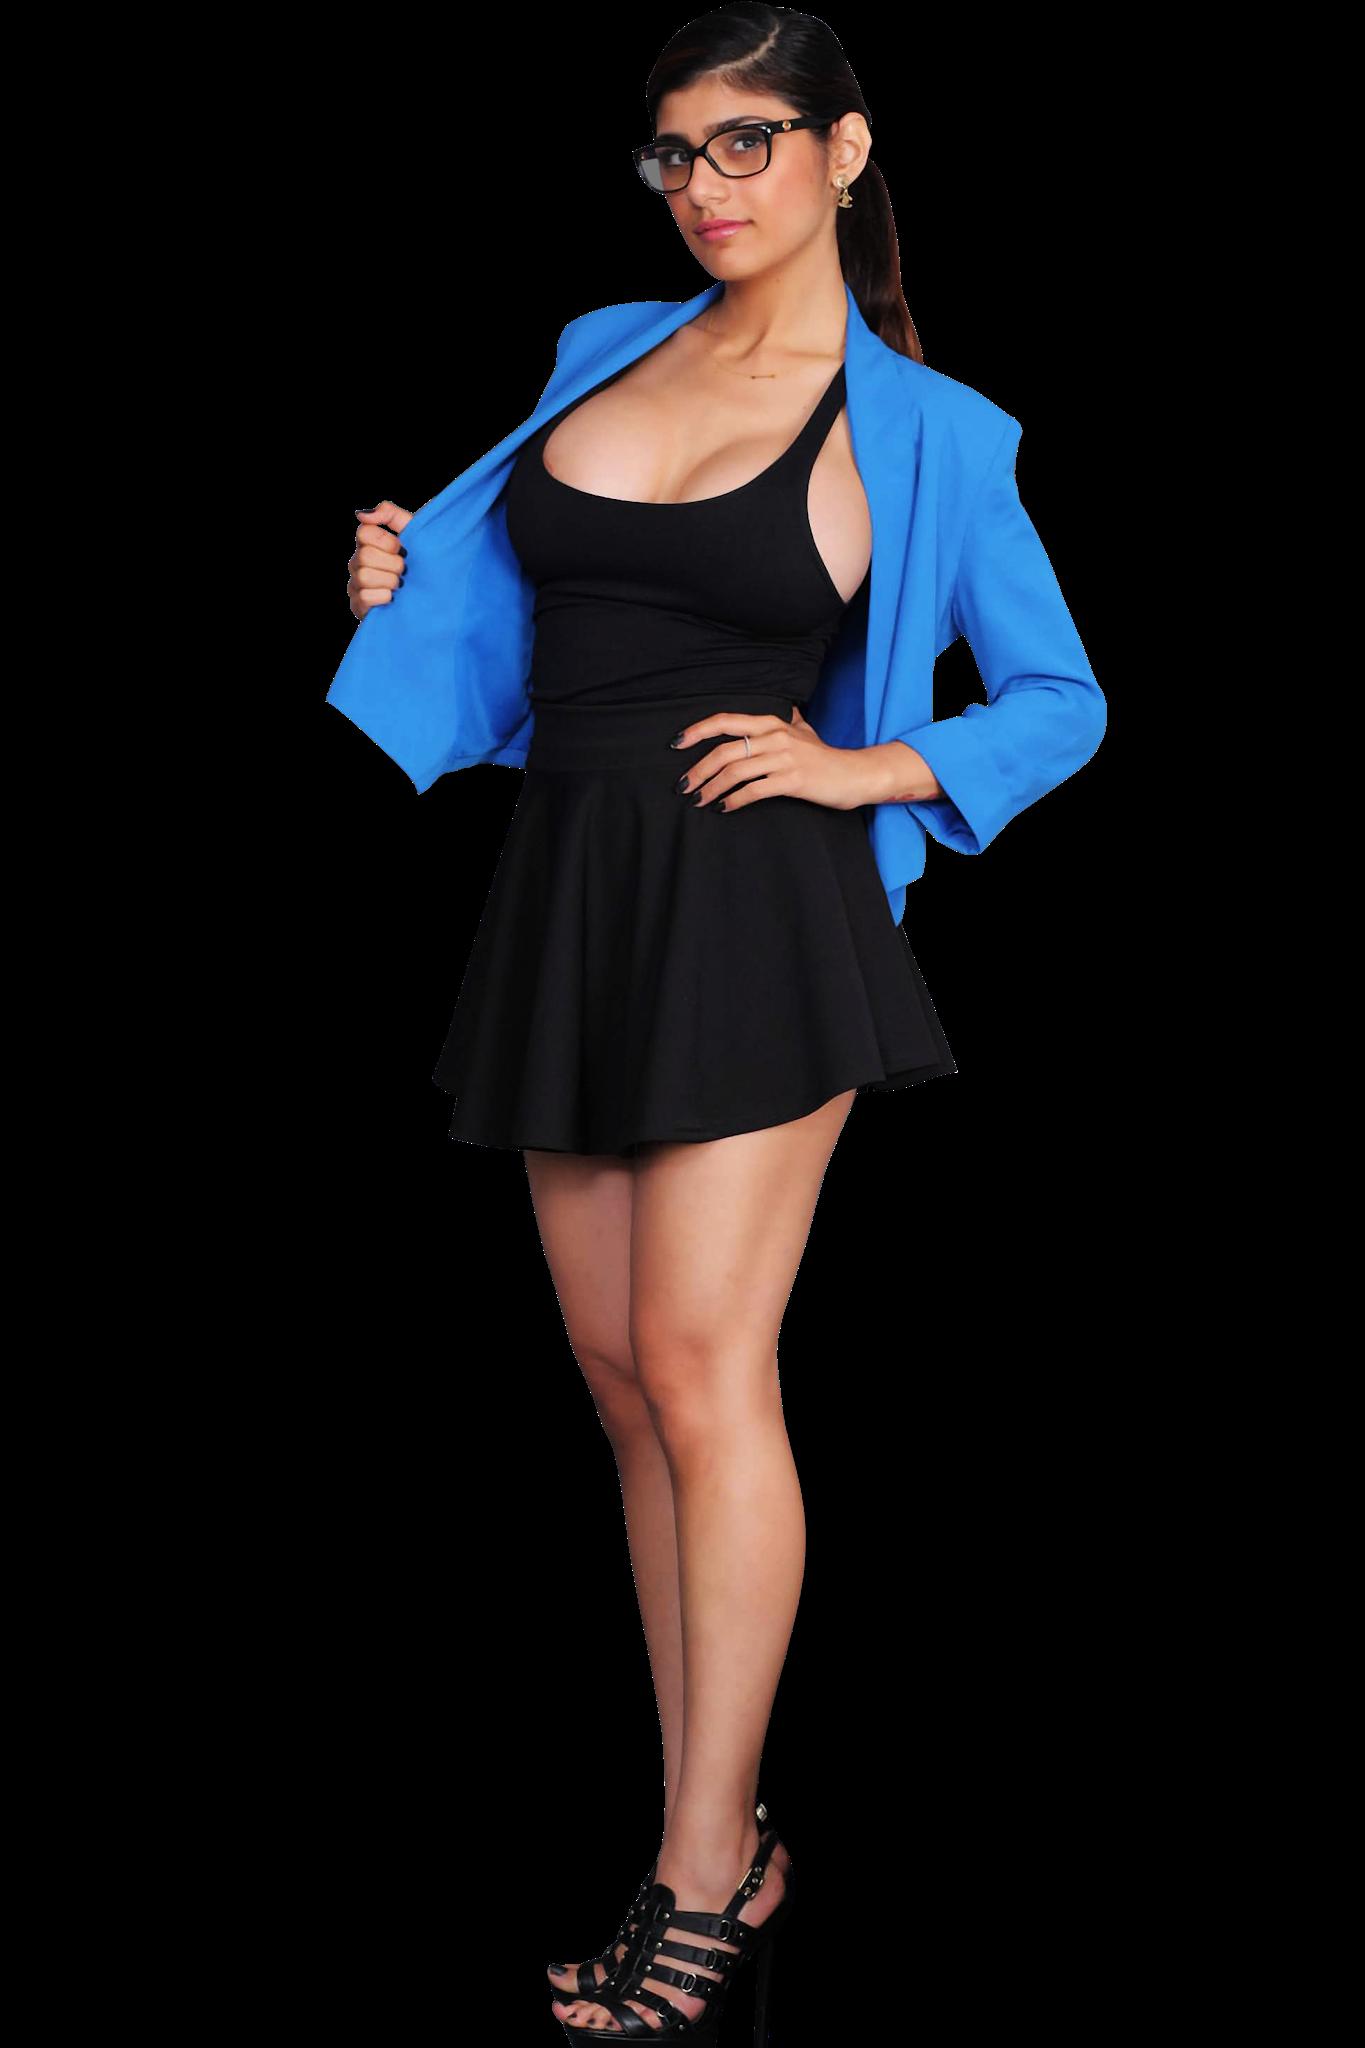 Models - Mia Khalifa  (11)